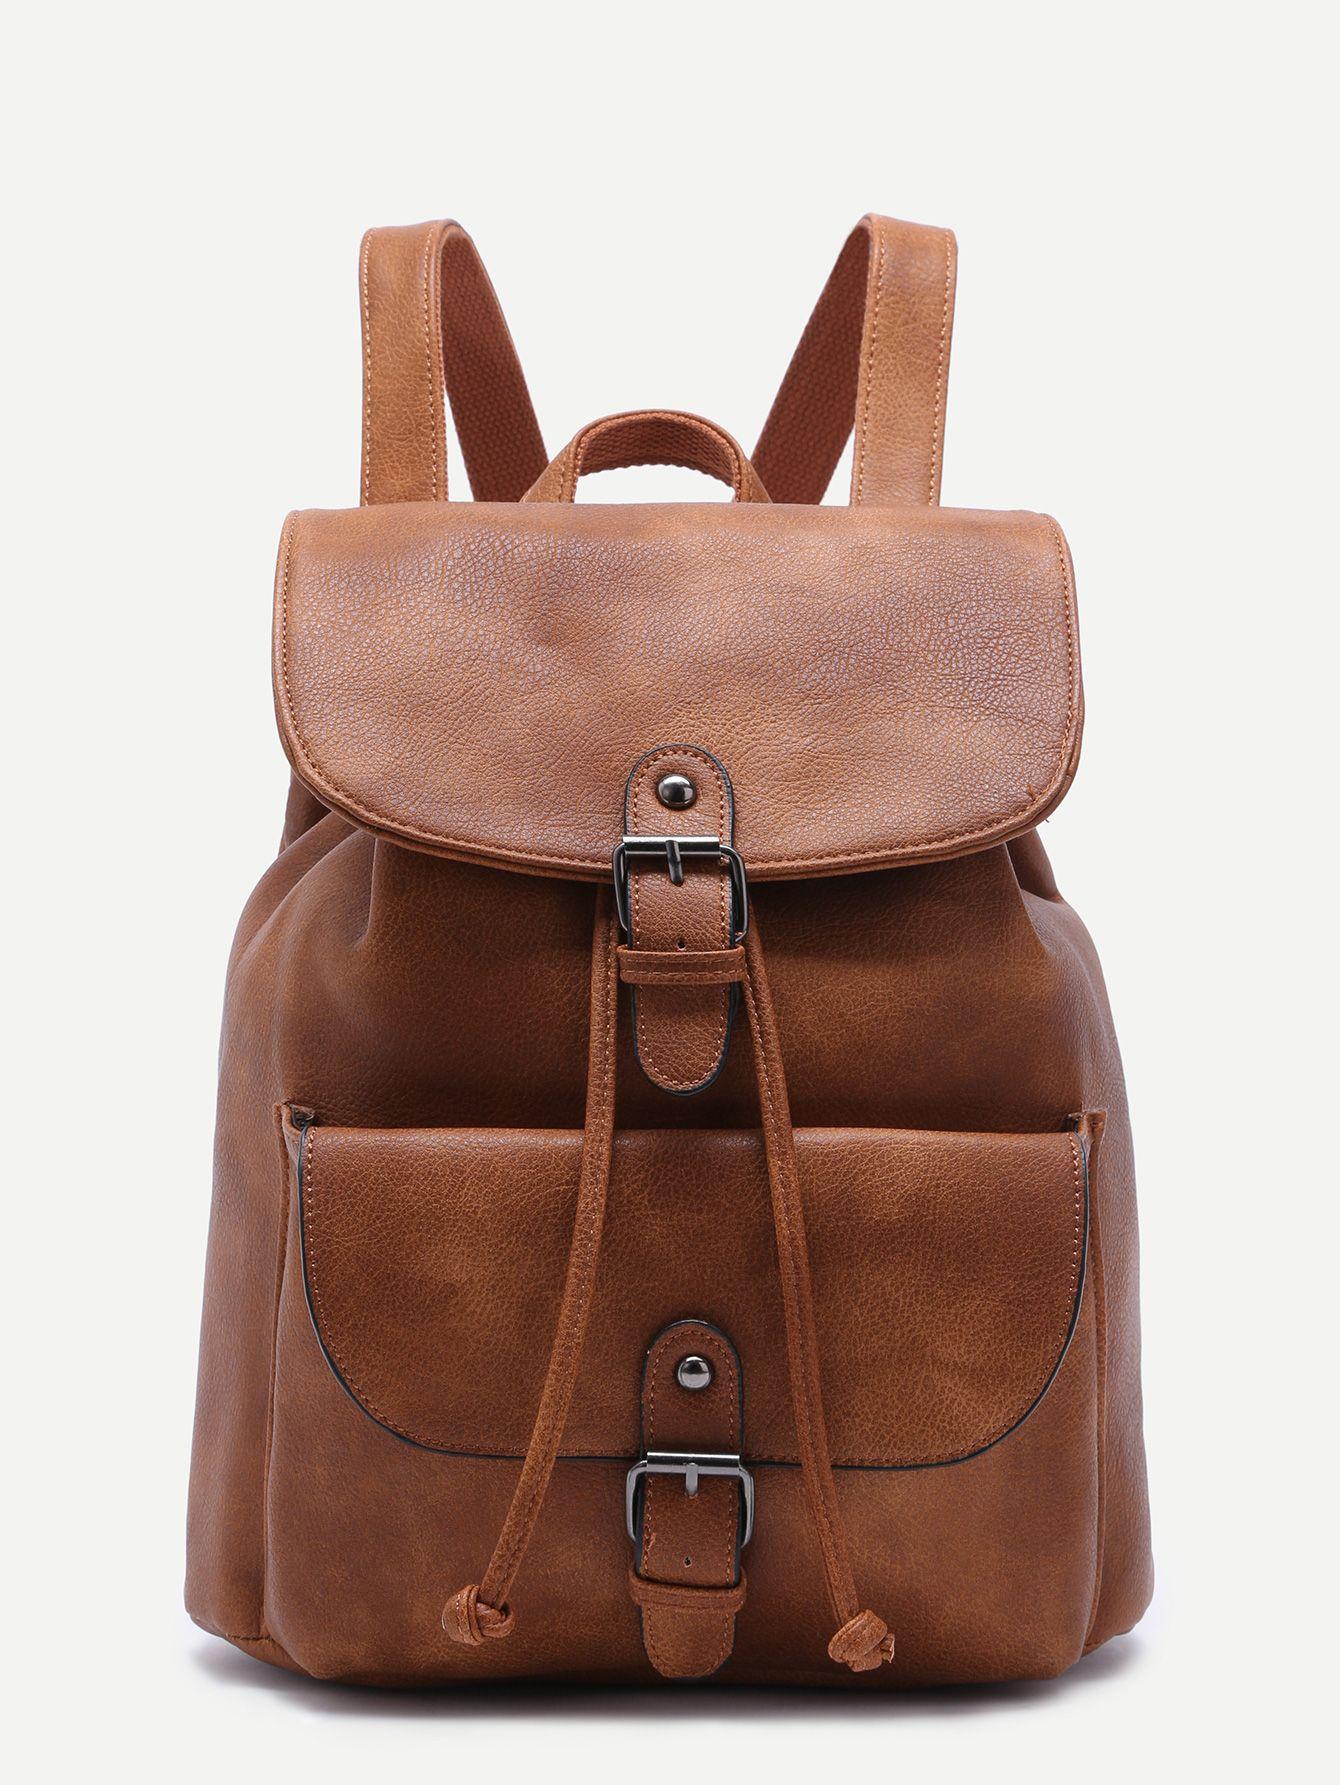 58b5fdeaf5 #AdoreWe #SheIn Bags - SheIn Khaki PU Buckle Strap Drawstring Flap Backpack  - AdoreWe.com